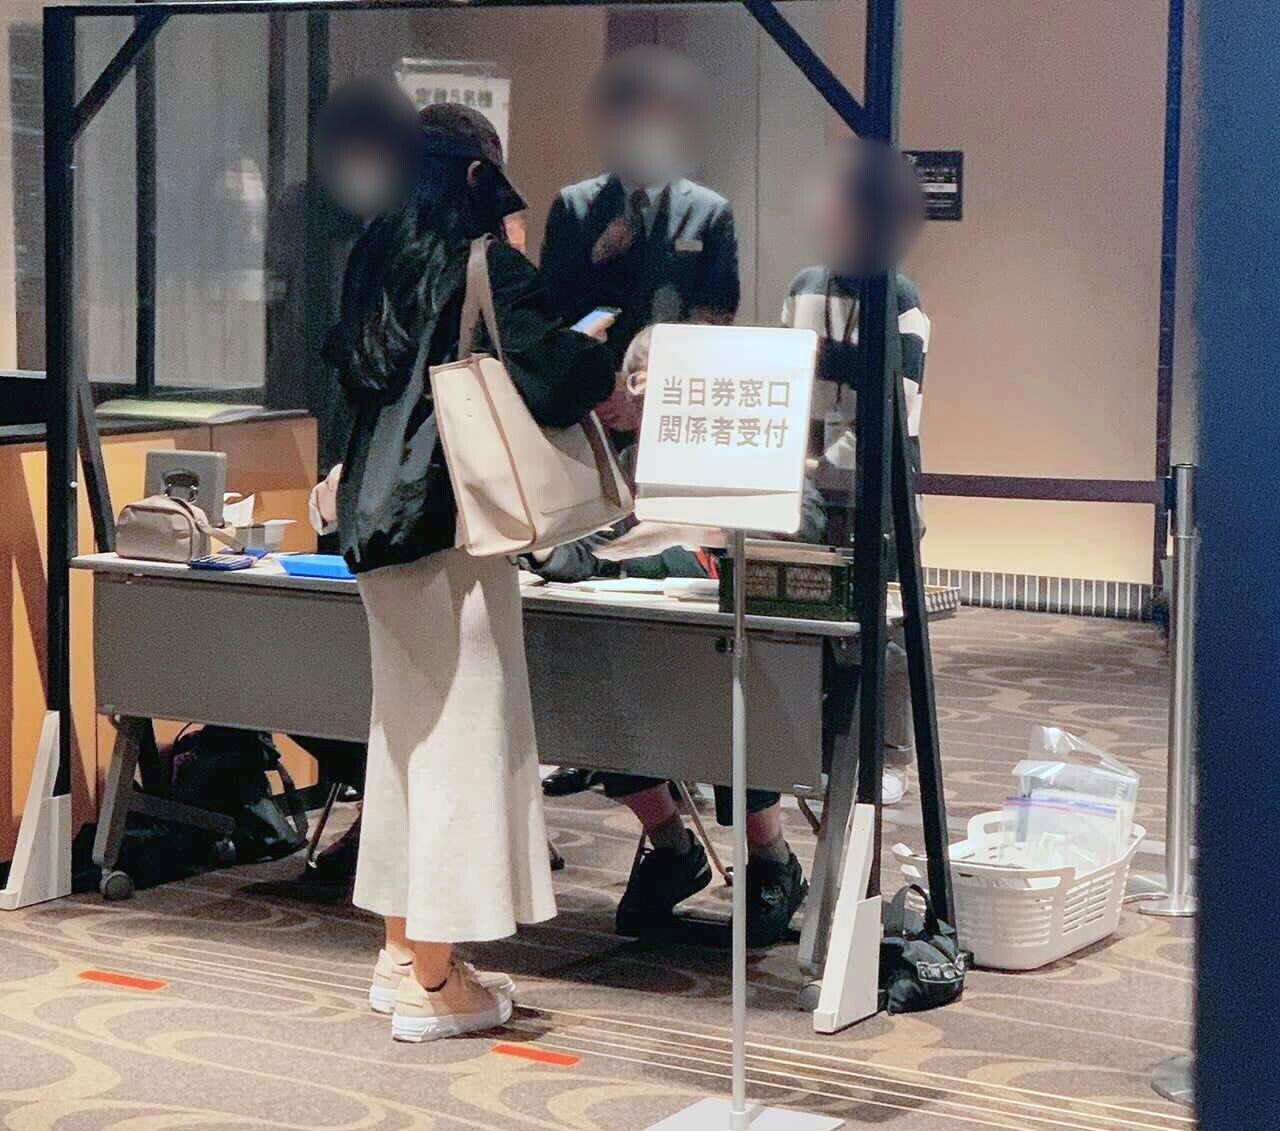 1JI8ePw.jpeg ㅇㅎ)일본 현재 난리난 연예계 스캔들